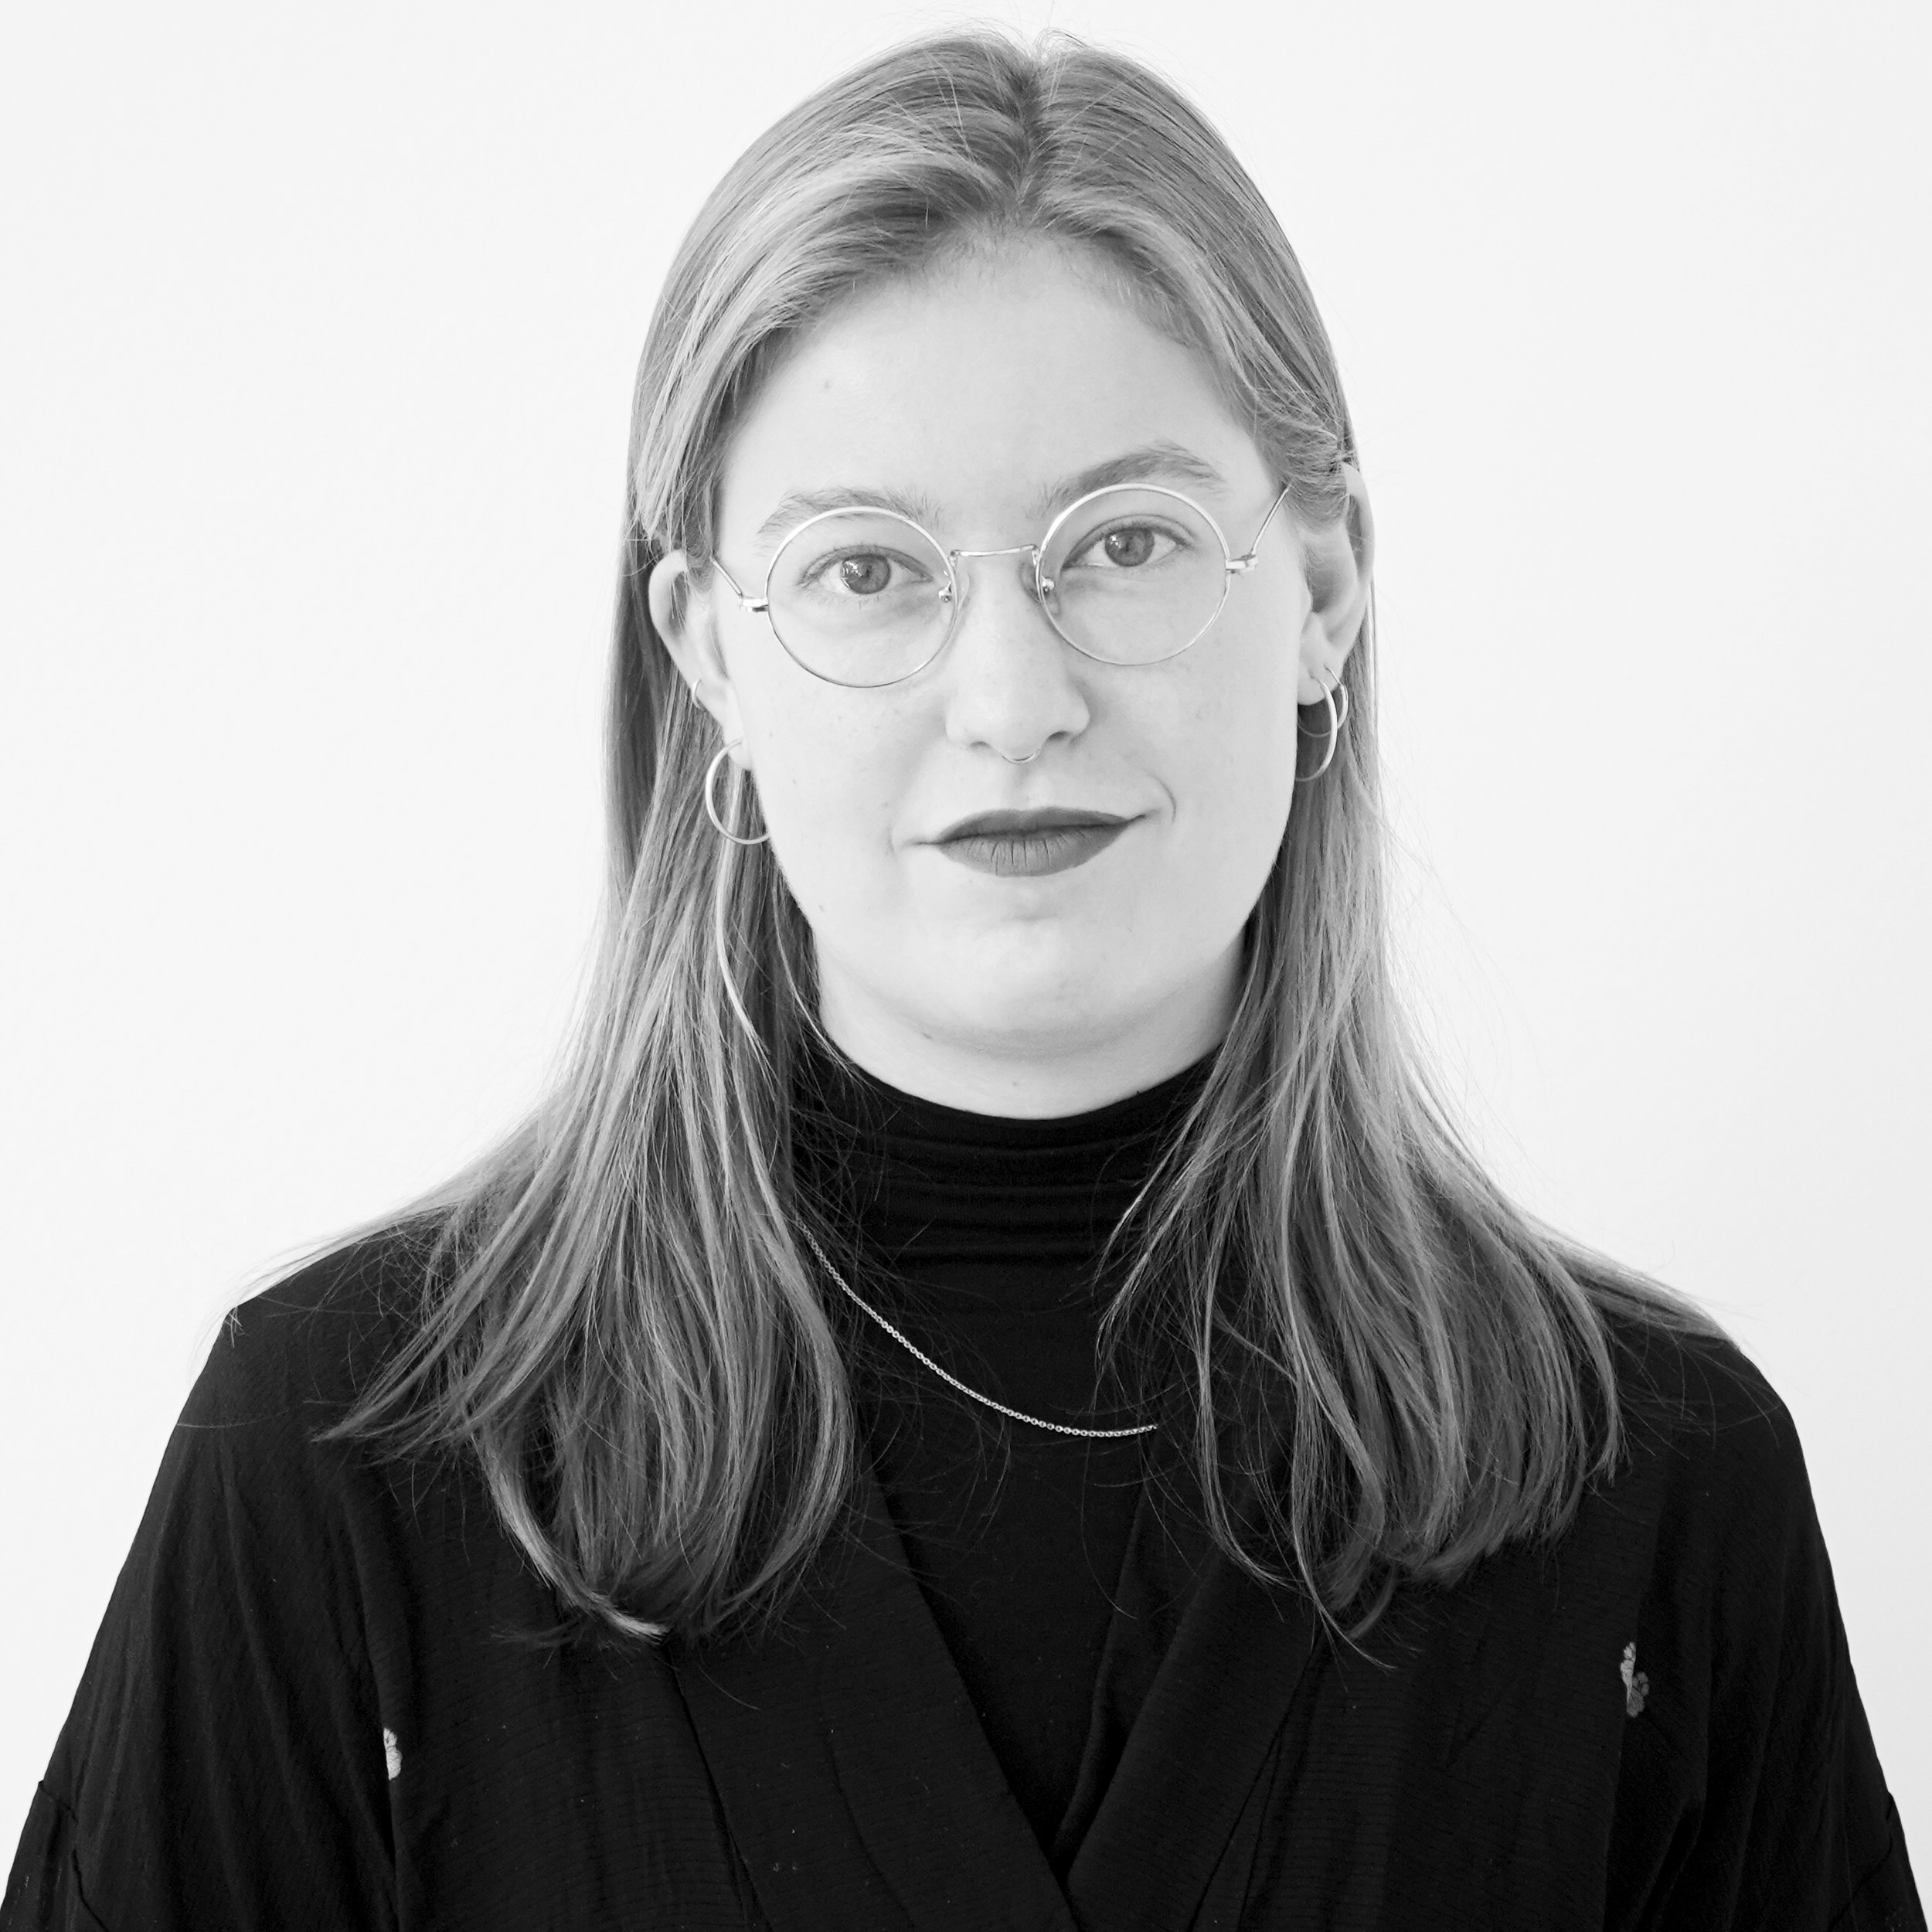 Andrea Bonderup